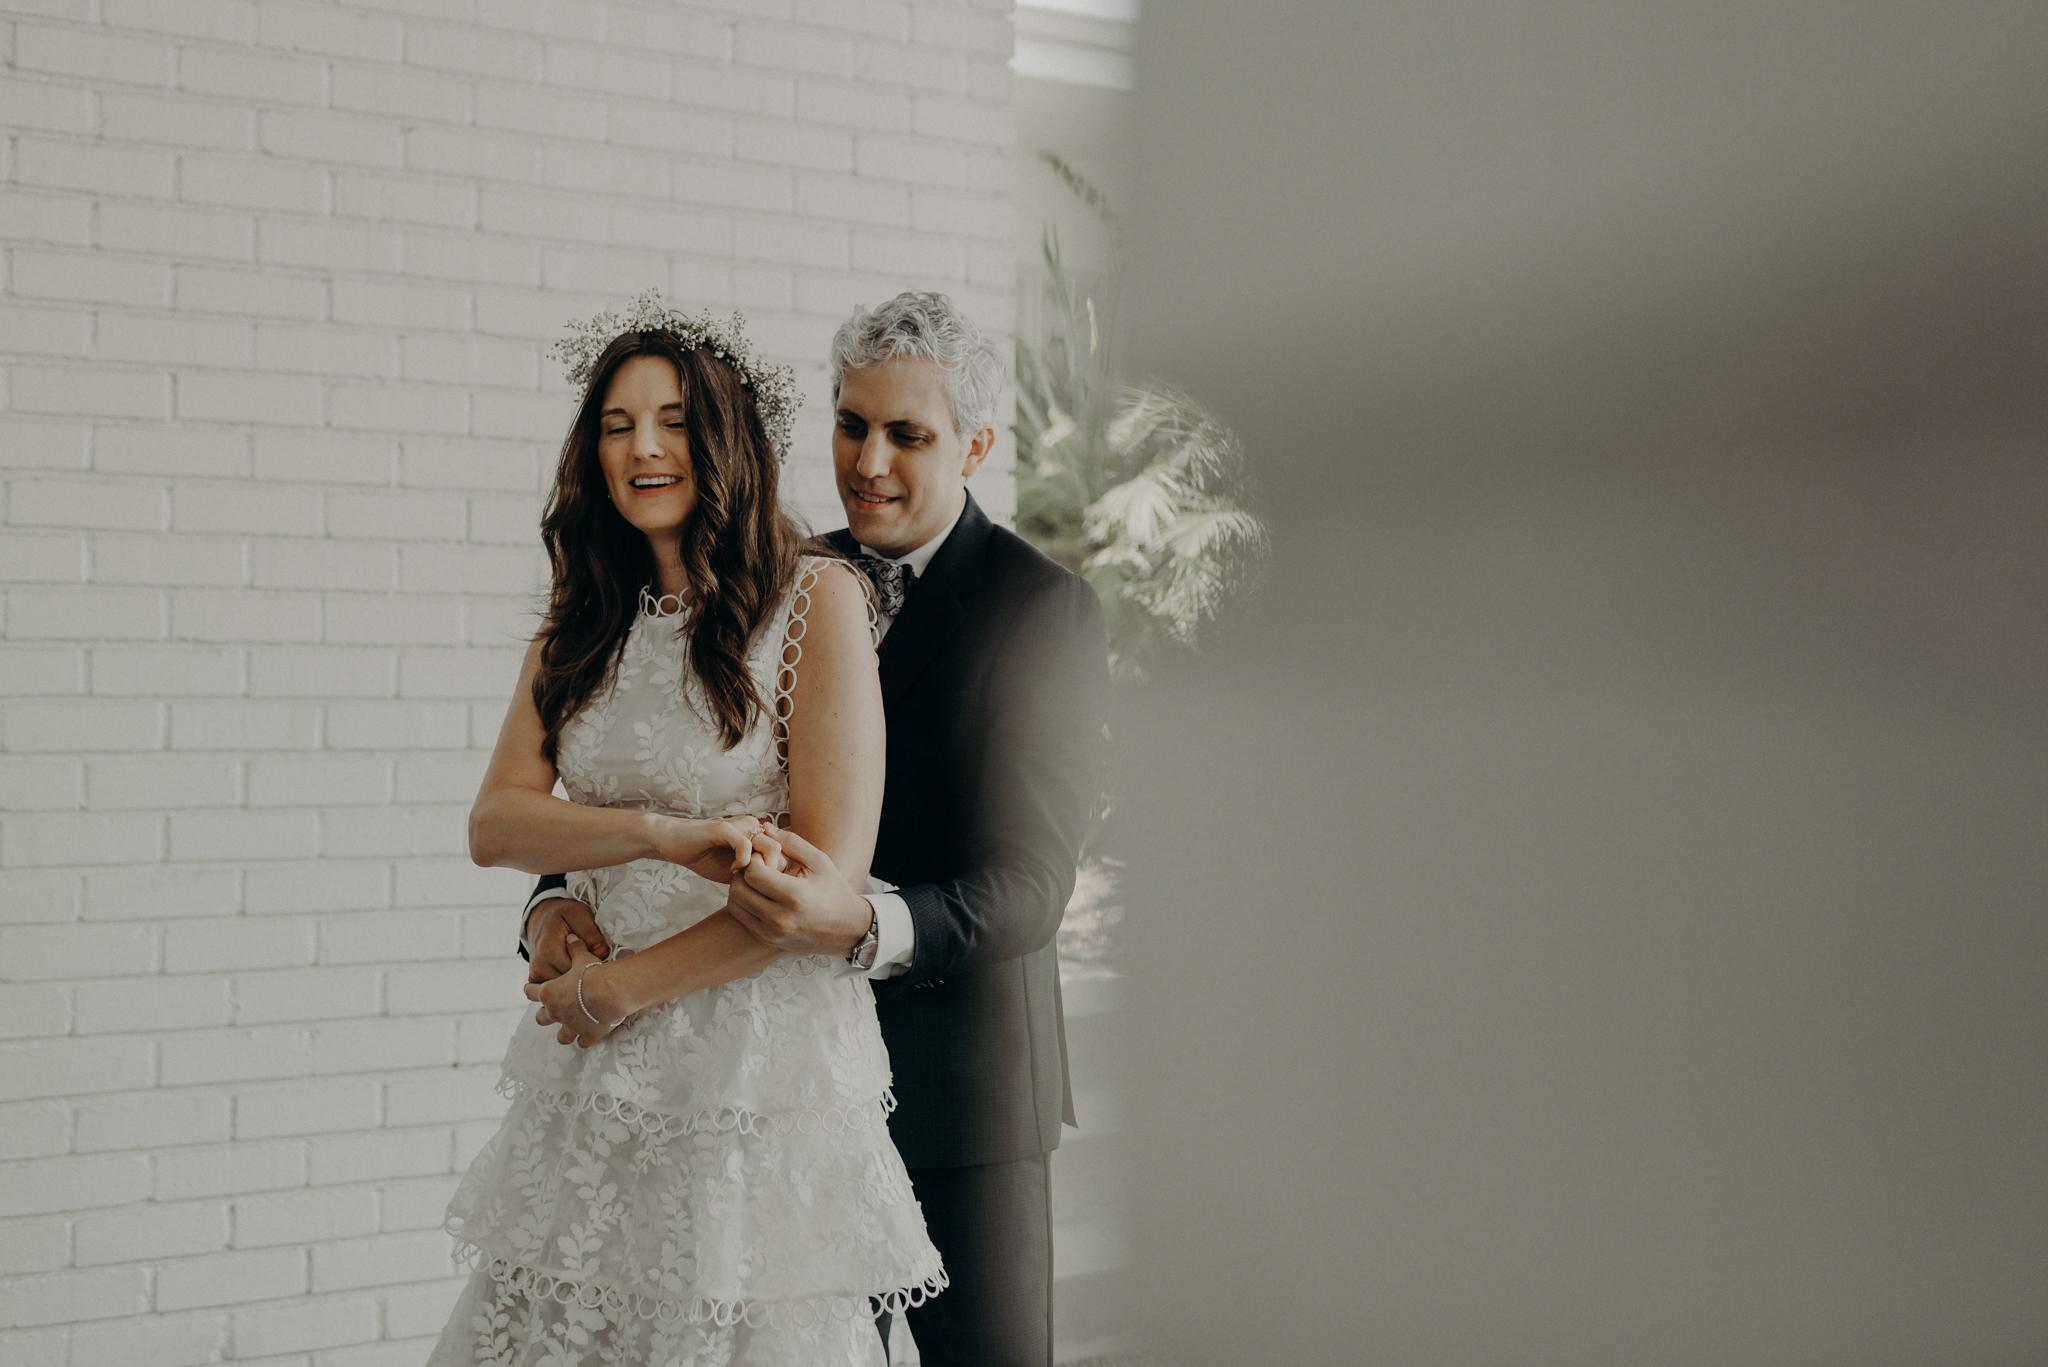 Isaiah + Taylor Photography - Private Estate Backyard Wedding - Beverly Hills - Los Angeles Wedding Photographer - 37.jpg